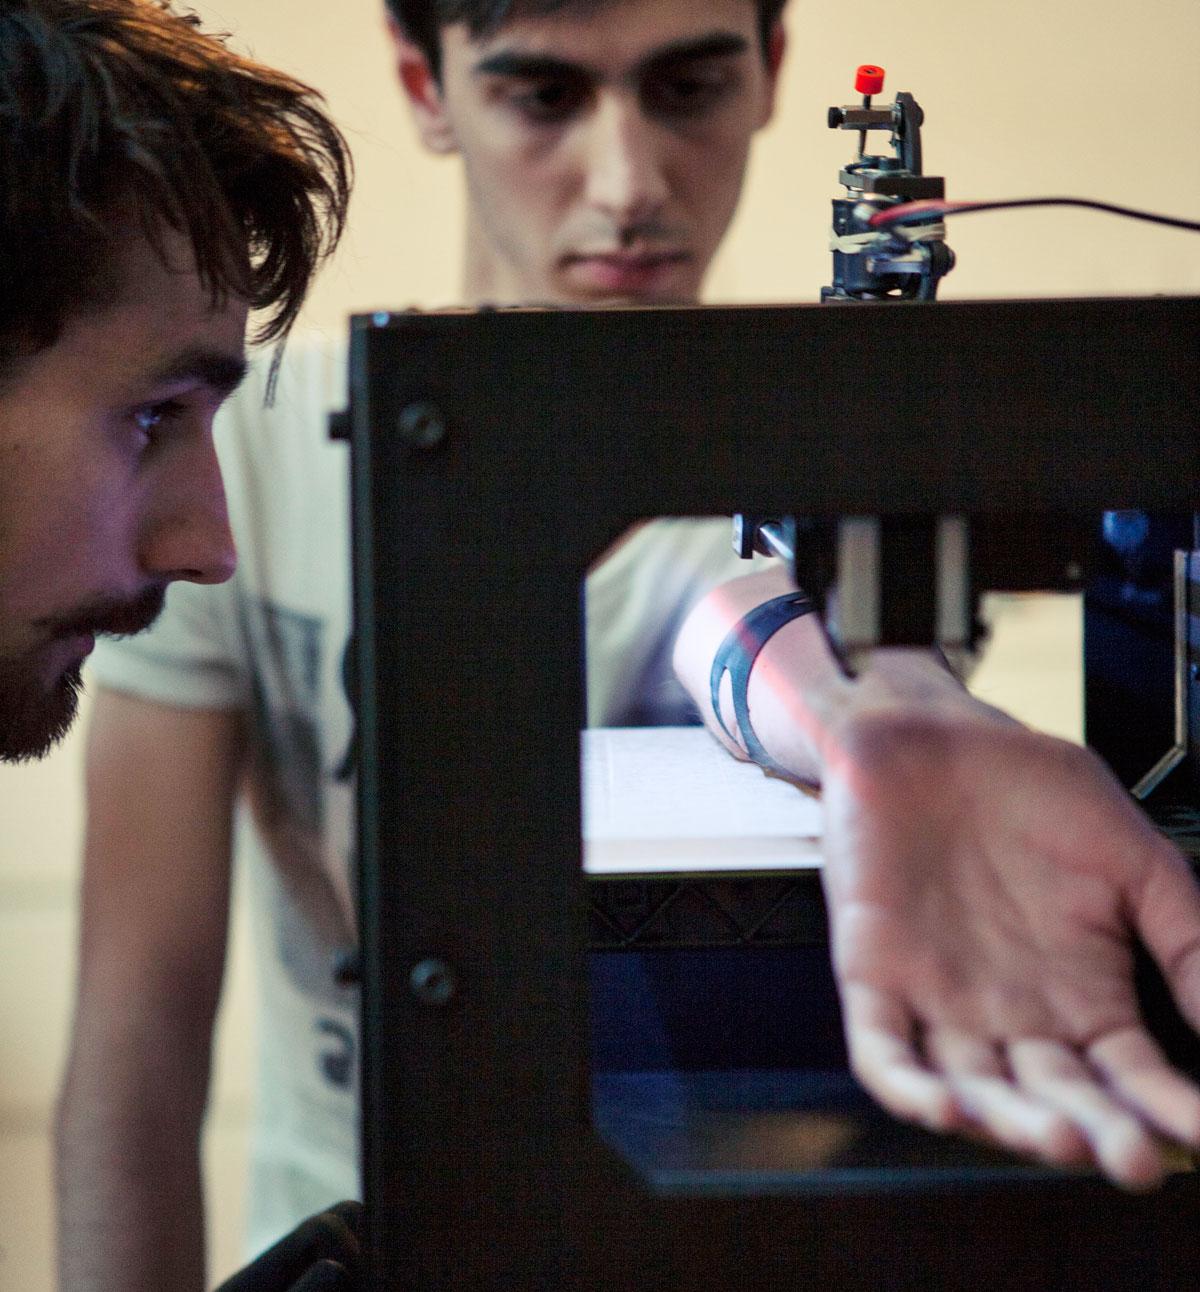 3D Printer X Tattoo Machine d'Appropriate Audiences